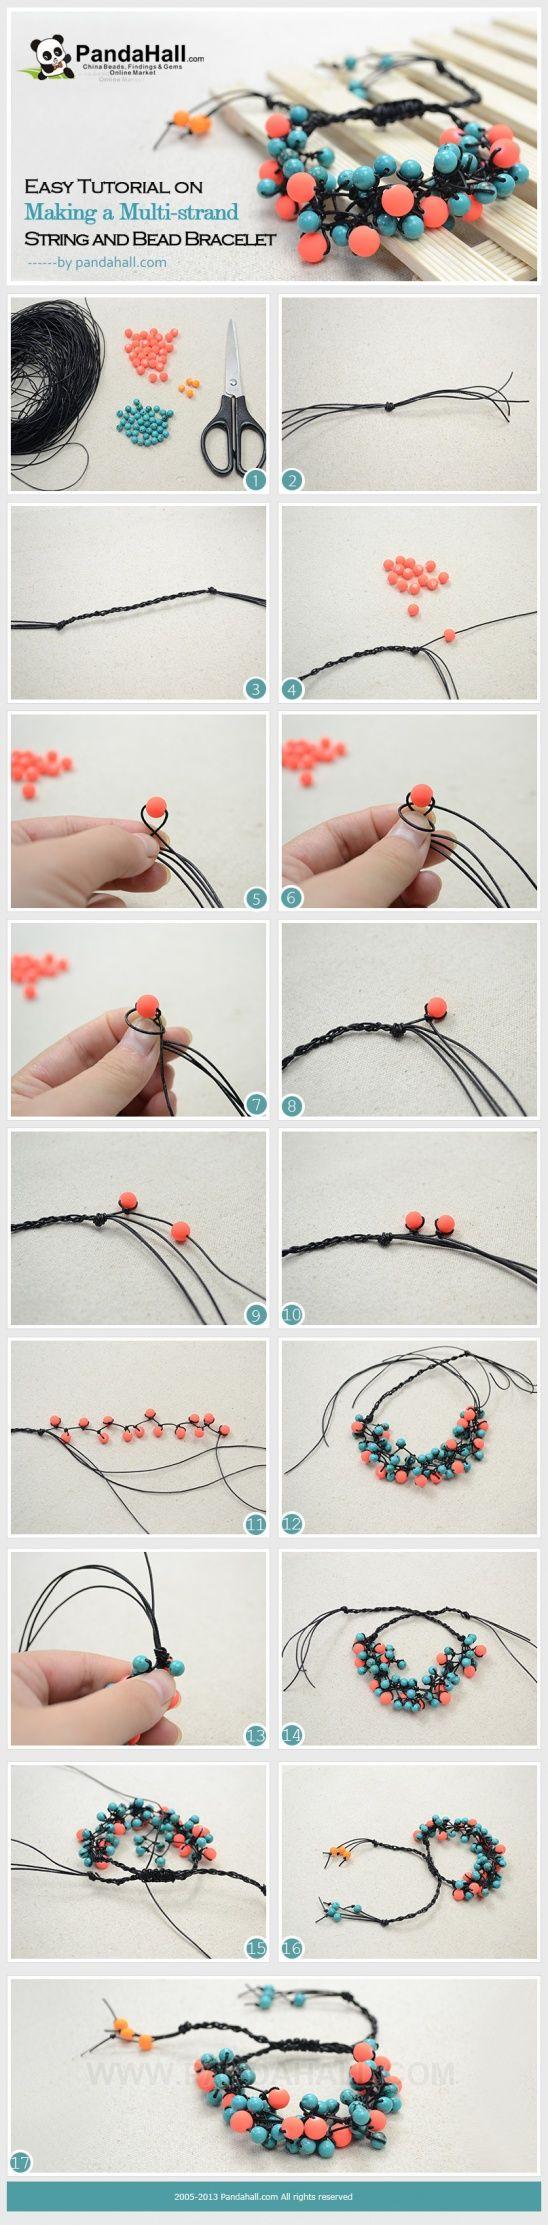 Easy Tutorial on Making a Multi-strand String and Bead Bracelet by vickyhall | Project | Jewelry / Bracelets | Kollabora